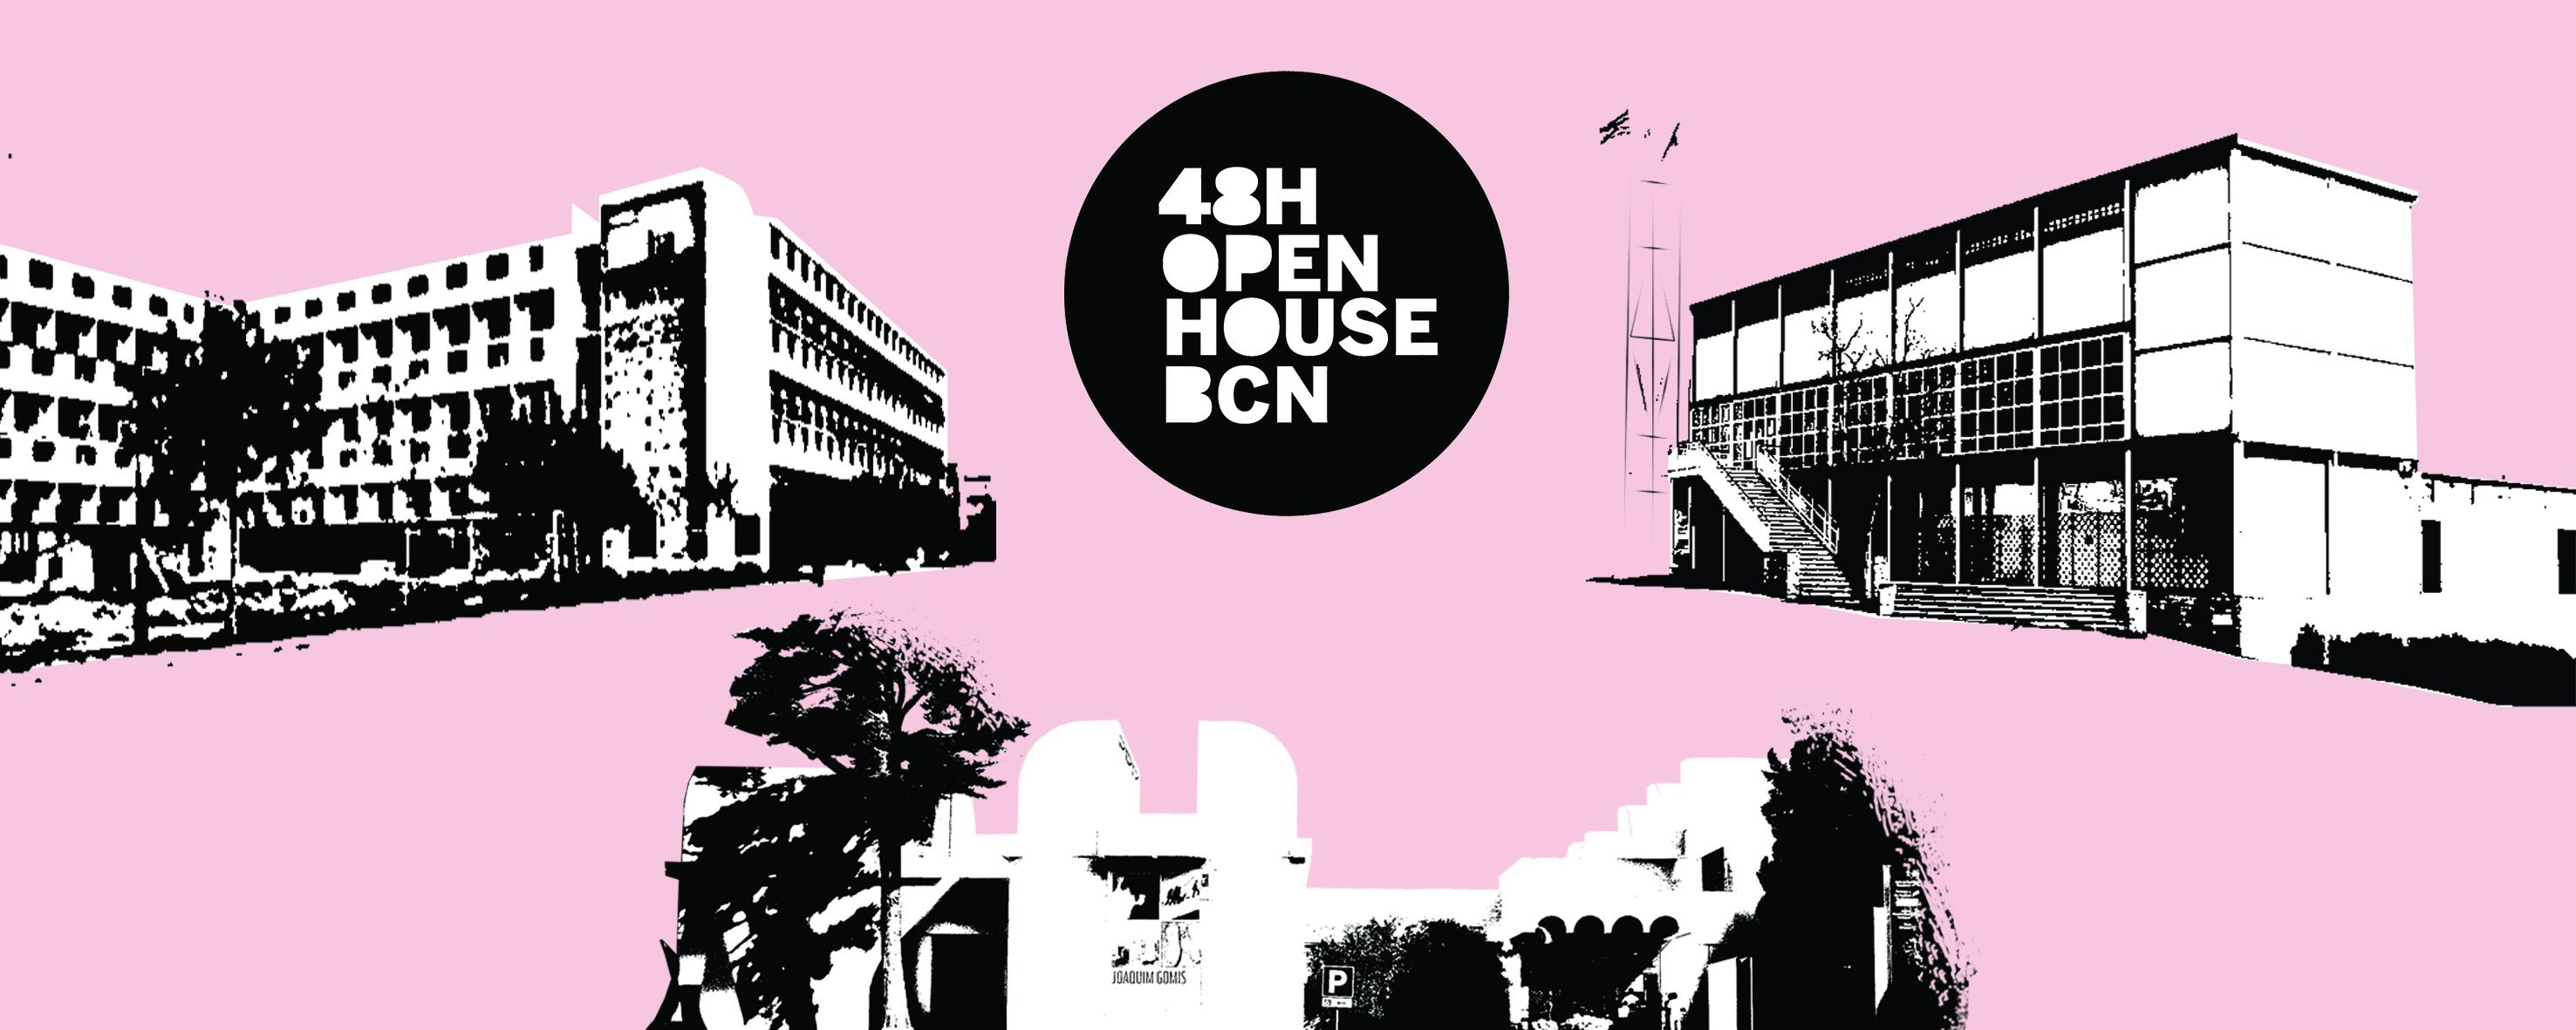 48h open house barcelona 2015 nueva oda a la arquitectura - Despachos de arquitectura en barcelona ...